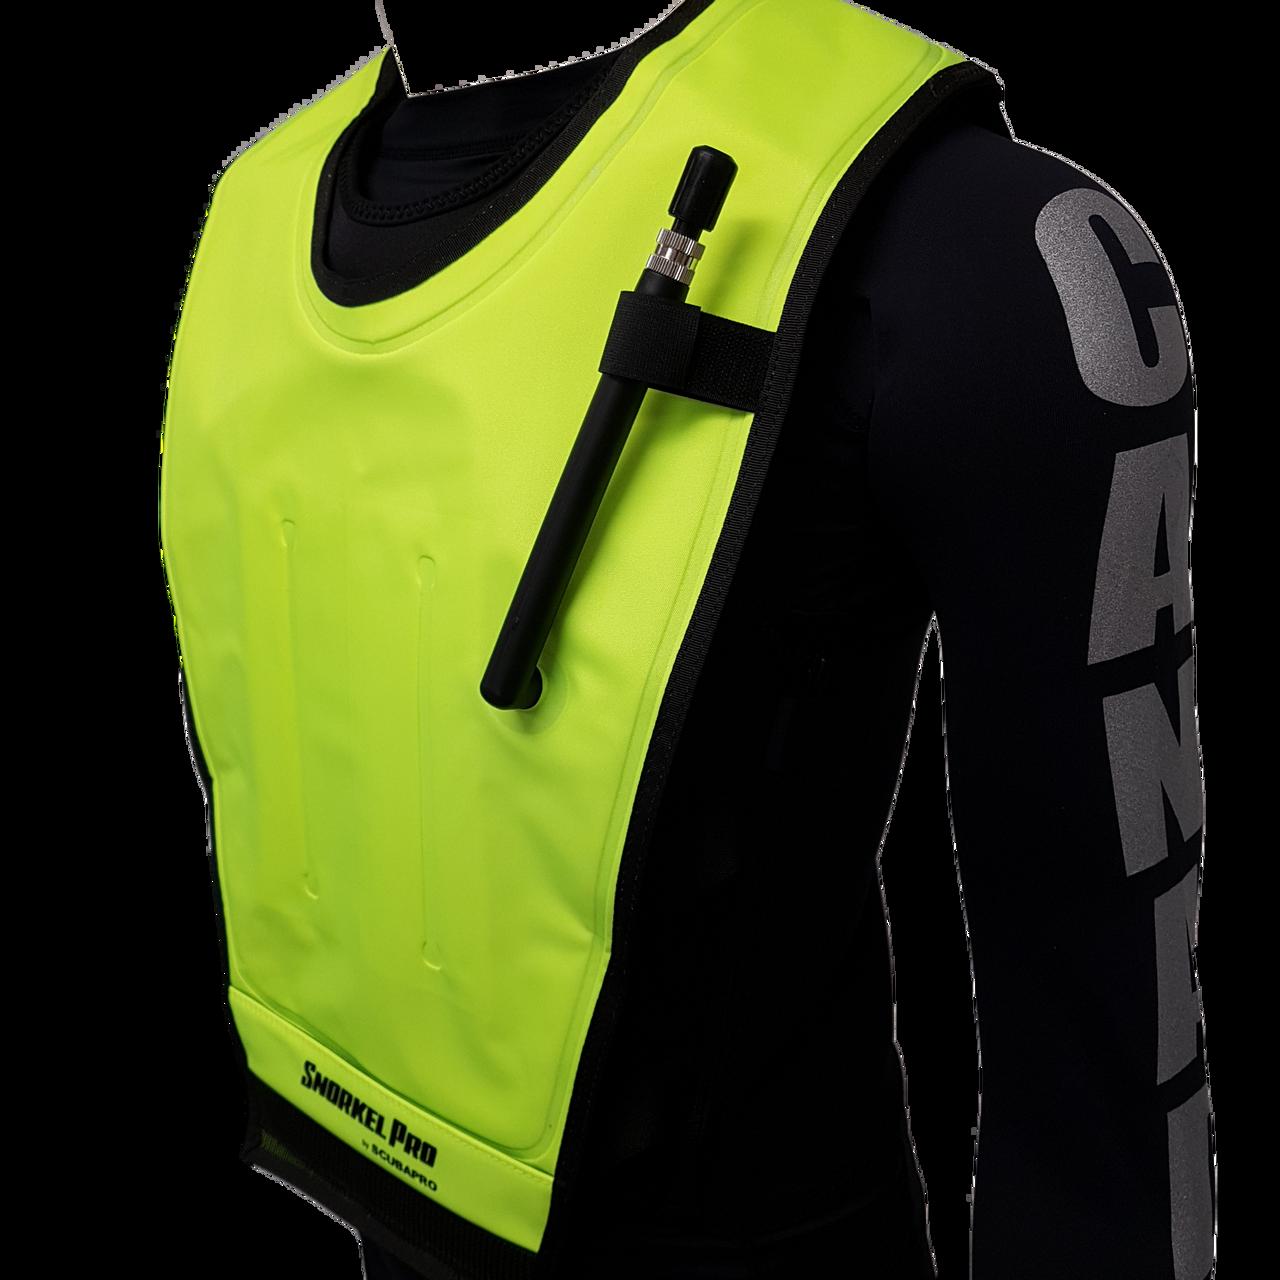 Black//Yellow X-Small Details about  /Scubapro Cruiser Snorkeling Vest